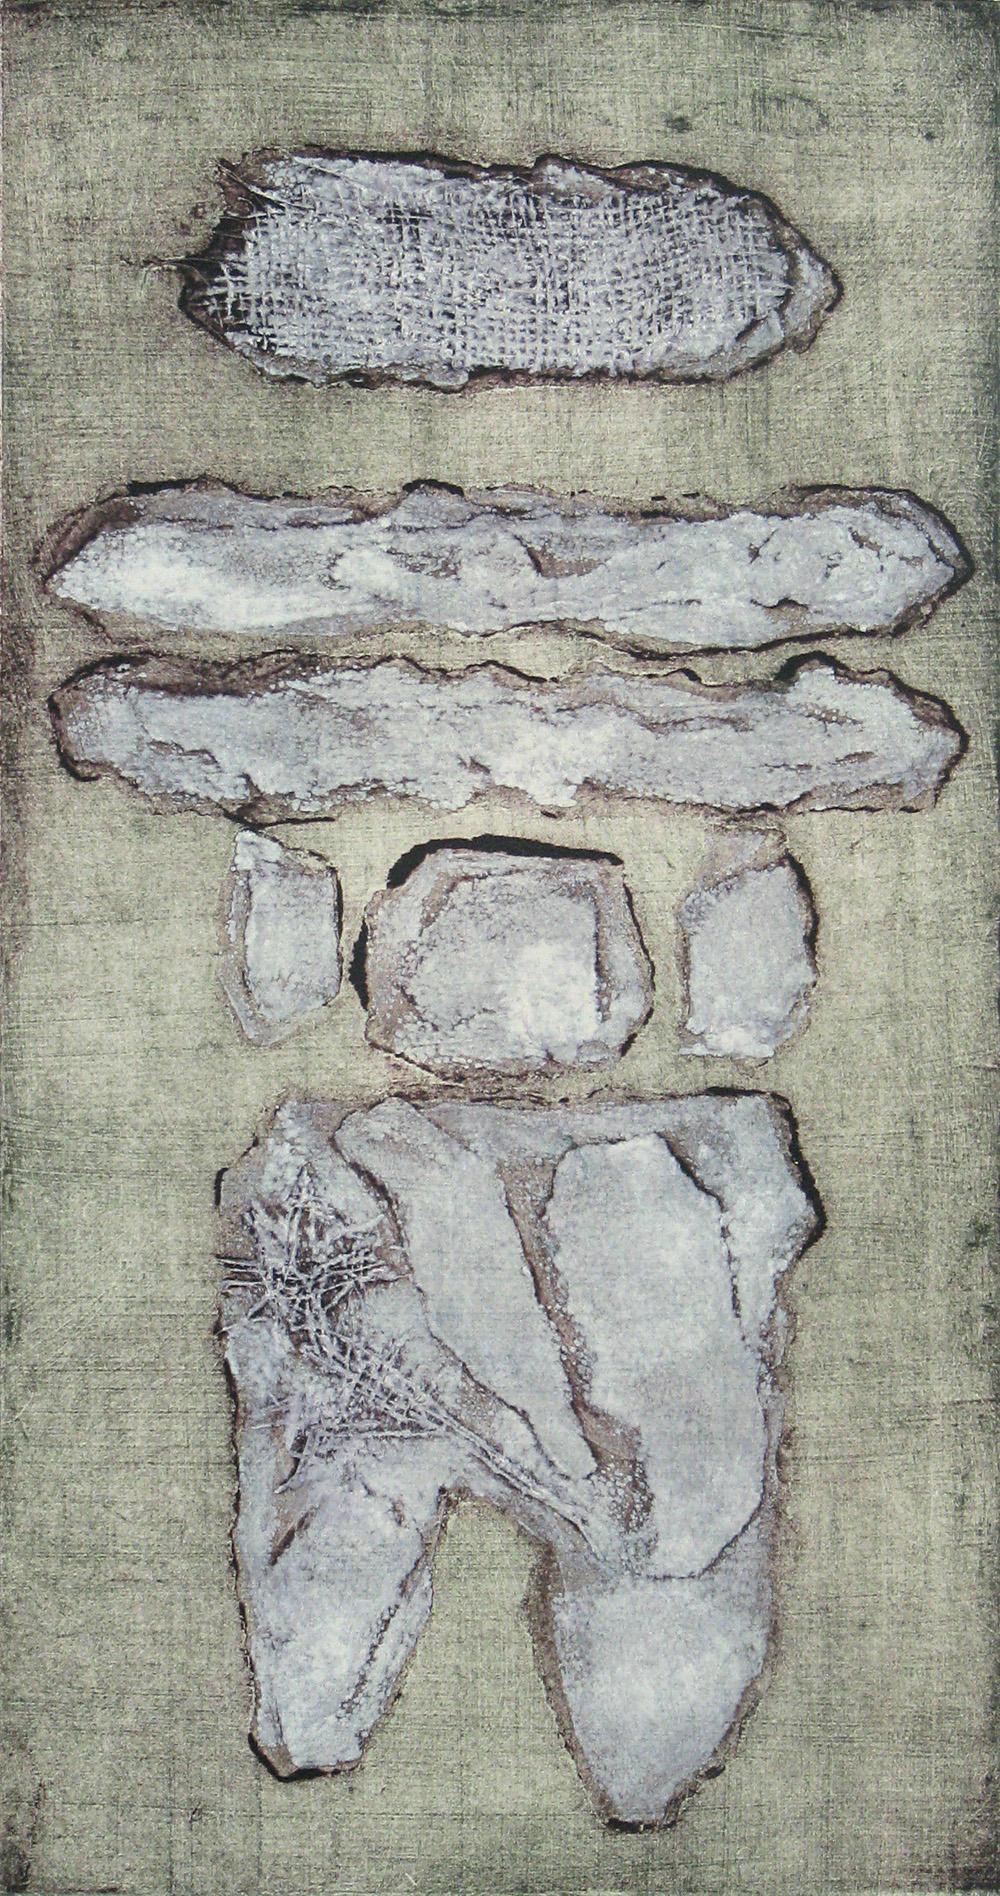 Prima Materia IV by Renee Iacone